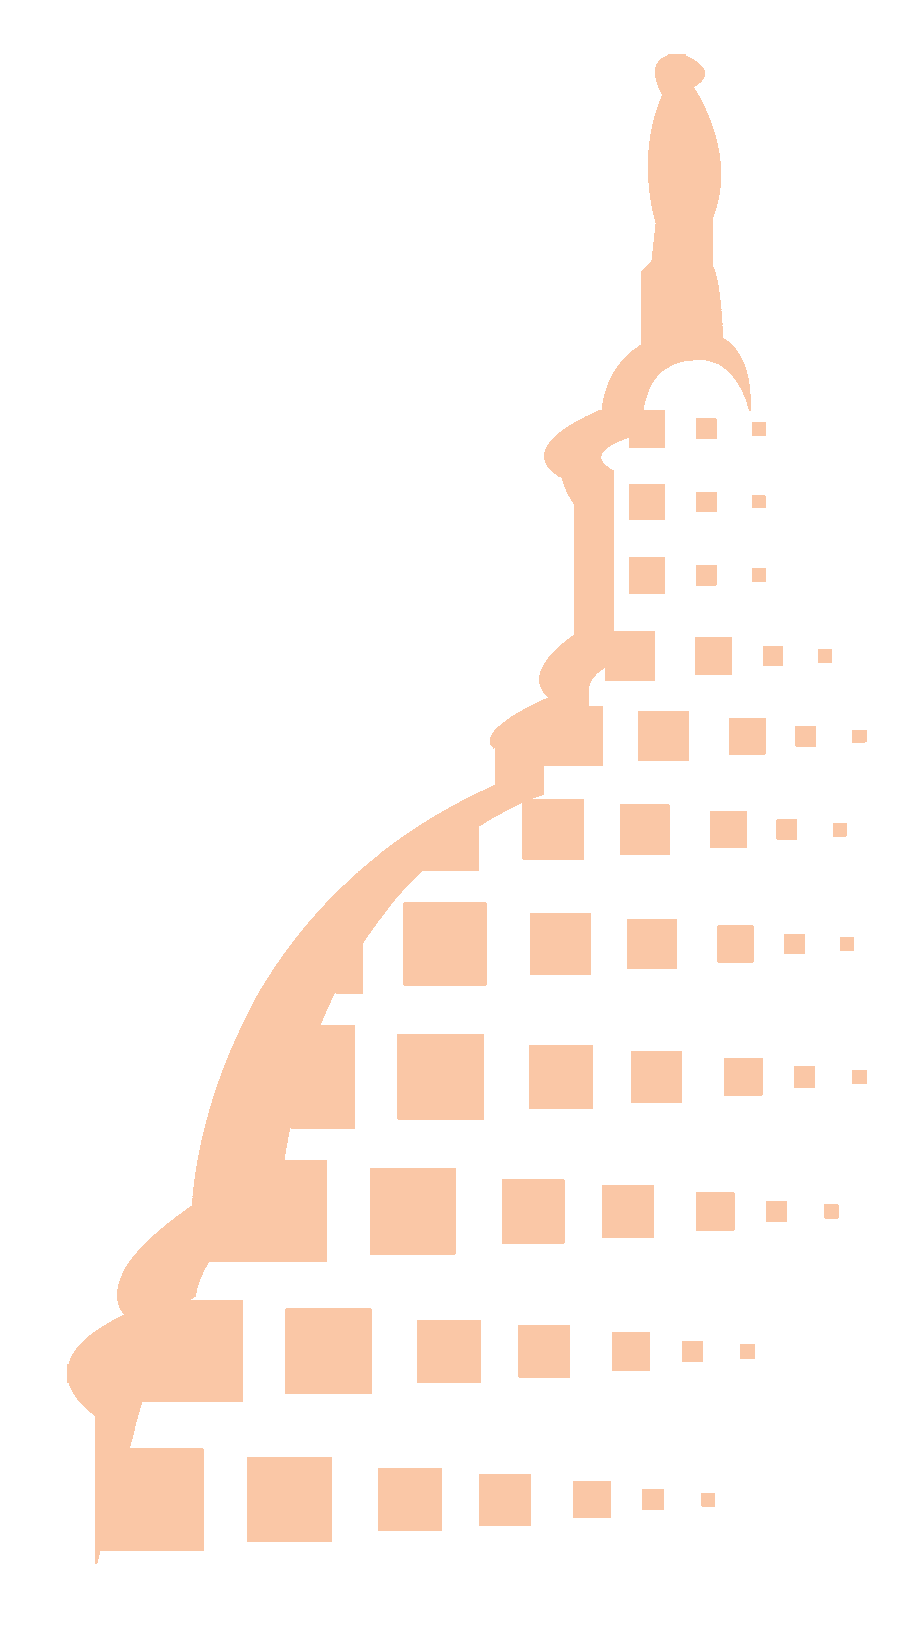 capitalbuildingicon-900-3-1